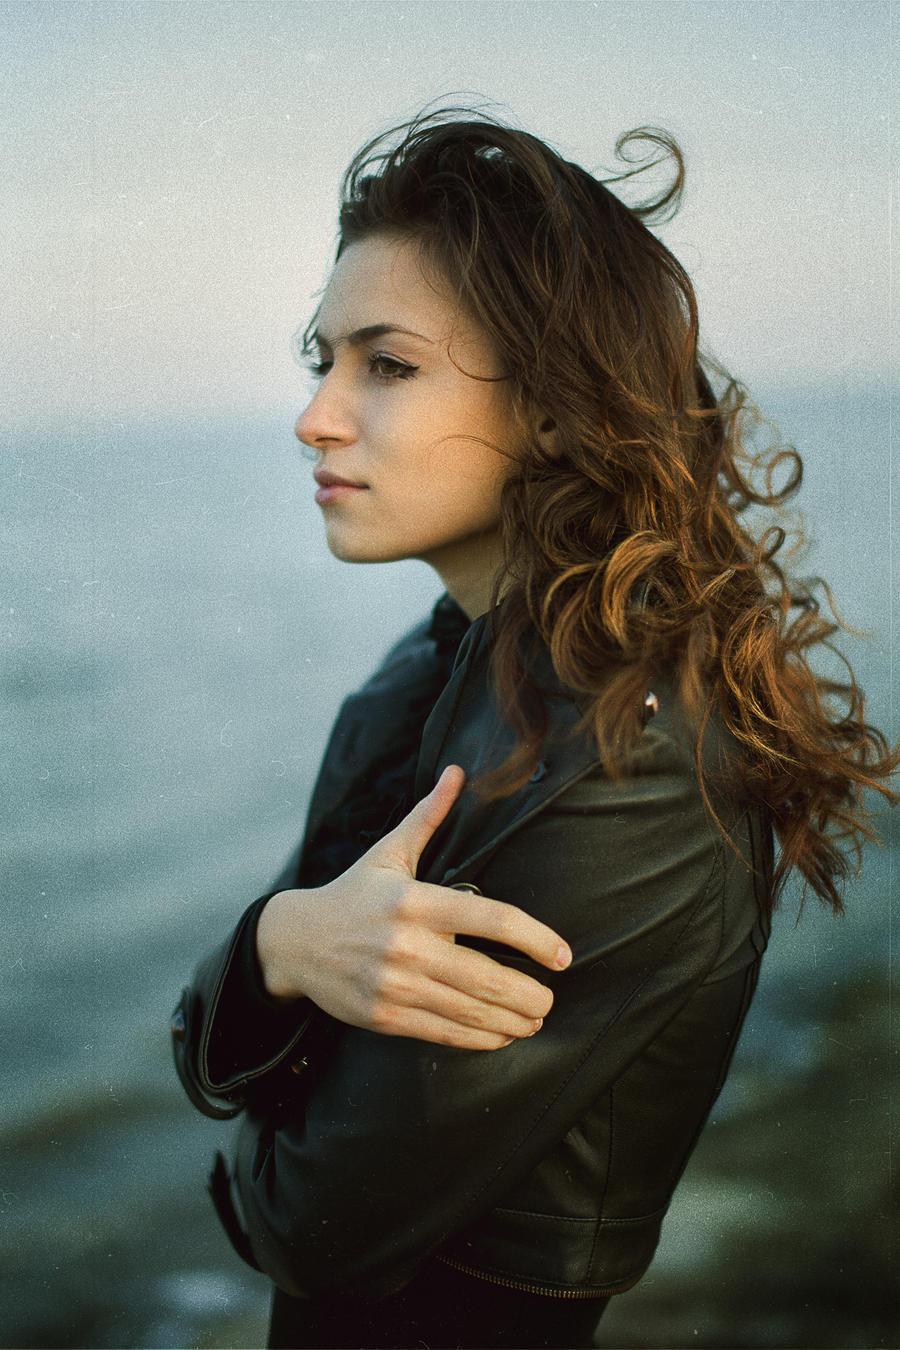 Tanya by Lapapunk